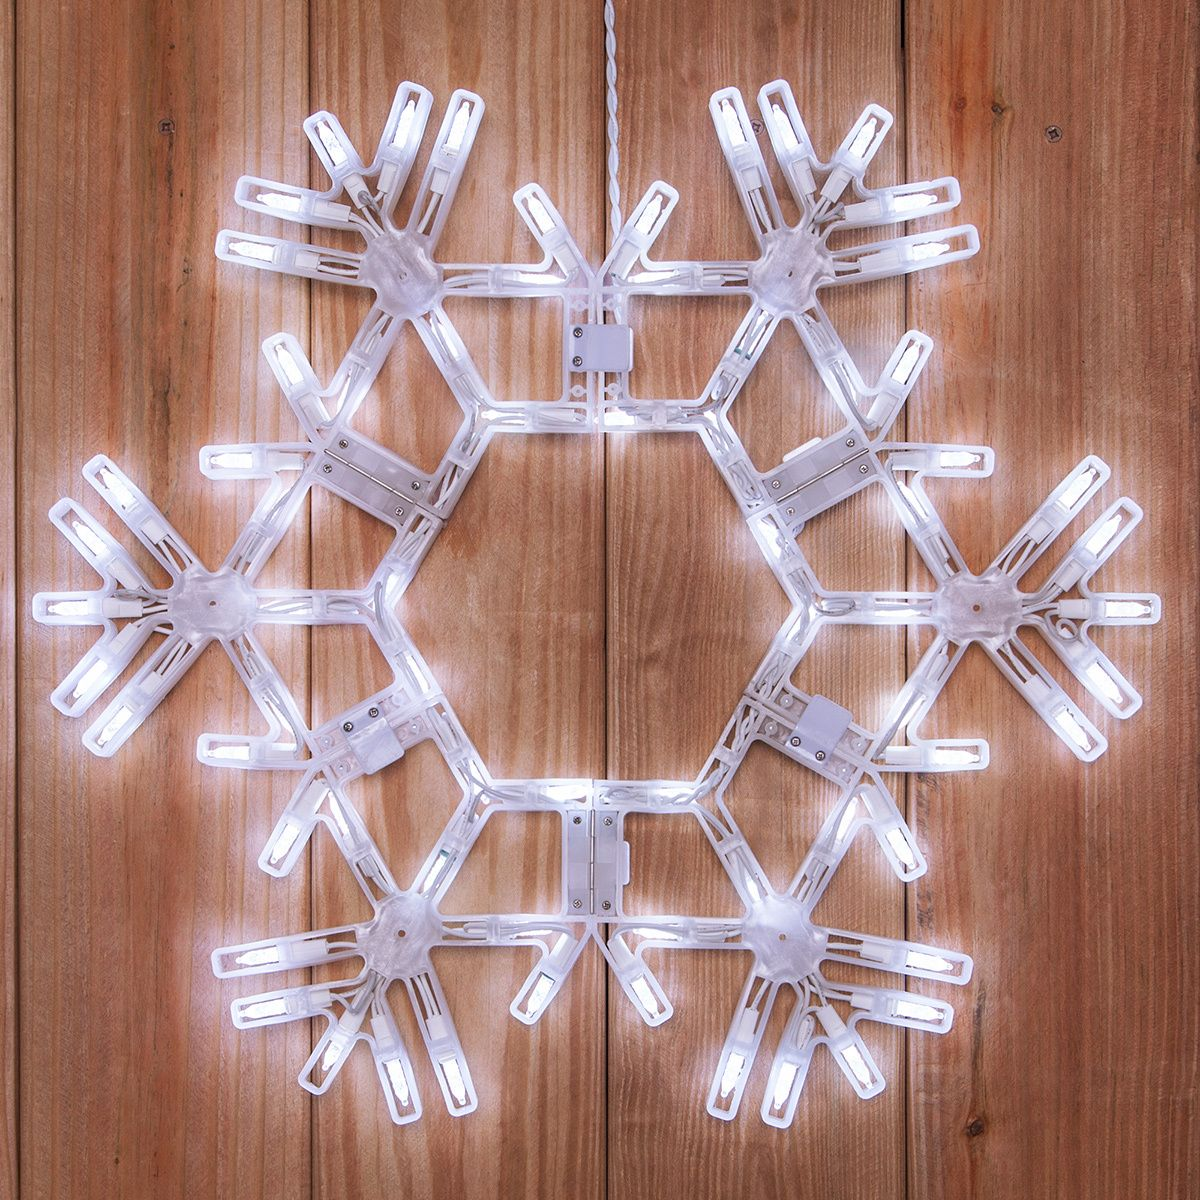 20 led folding snowflake decoration 70 cool white lights 20 led folding snowflake decoration 70 cool white lights aloadofball Image collections